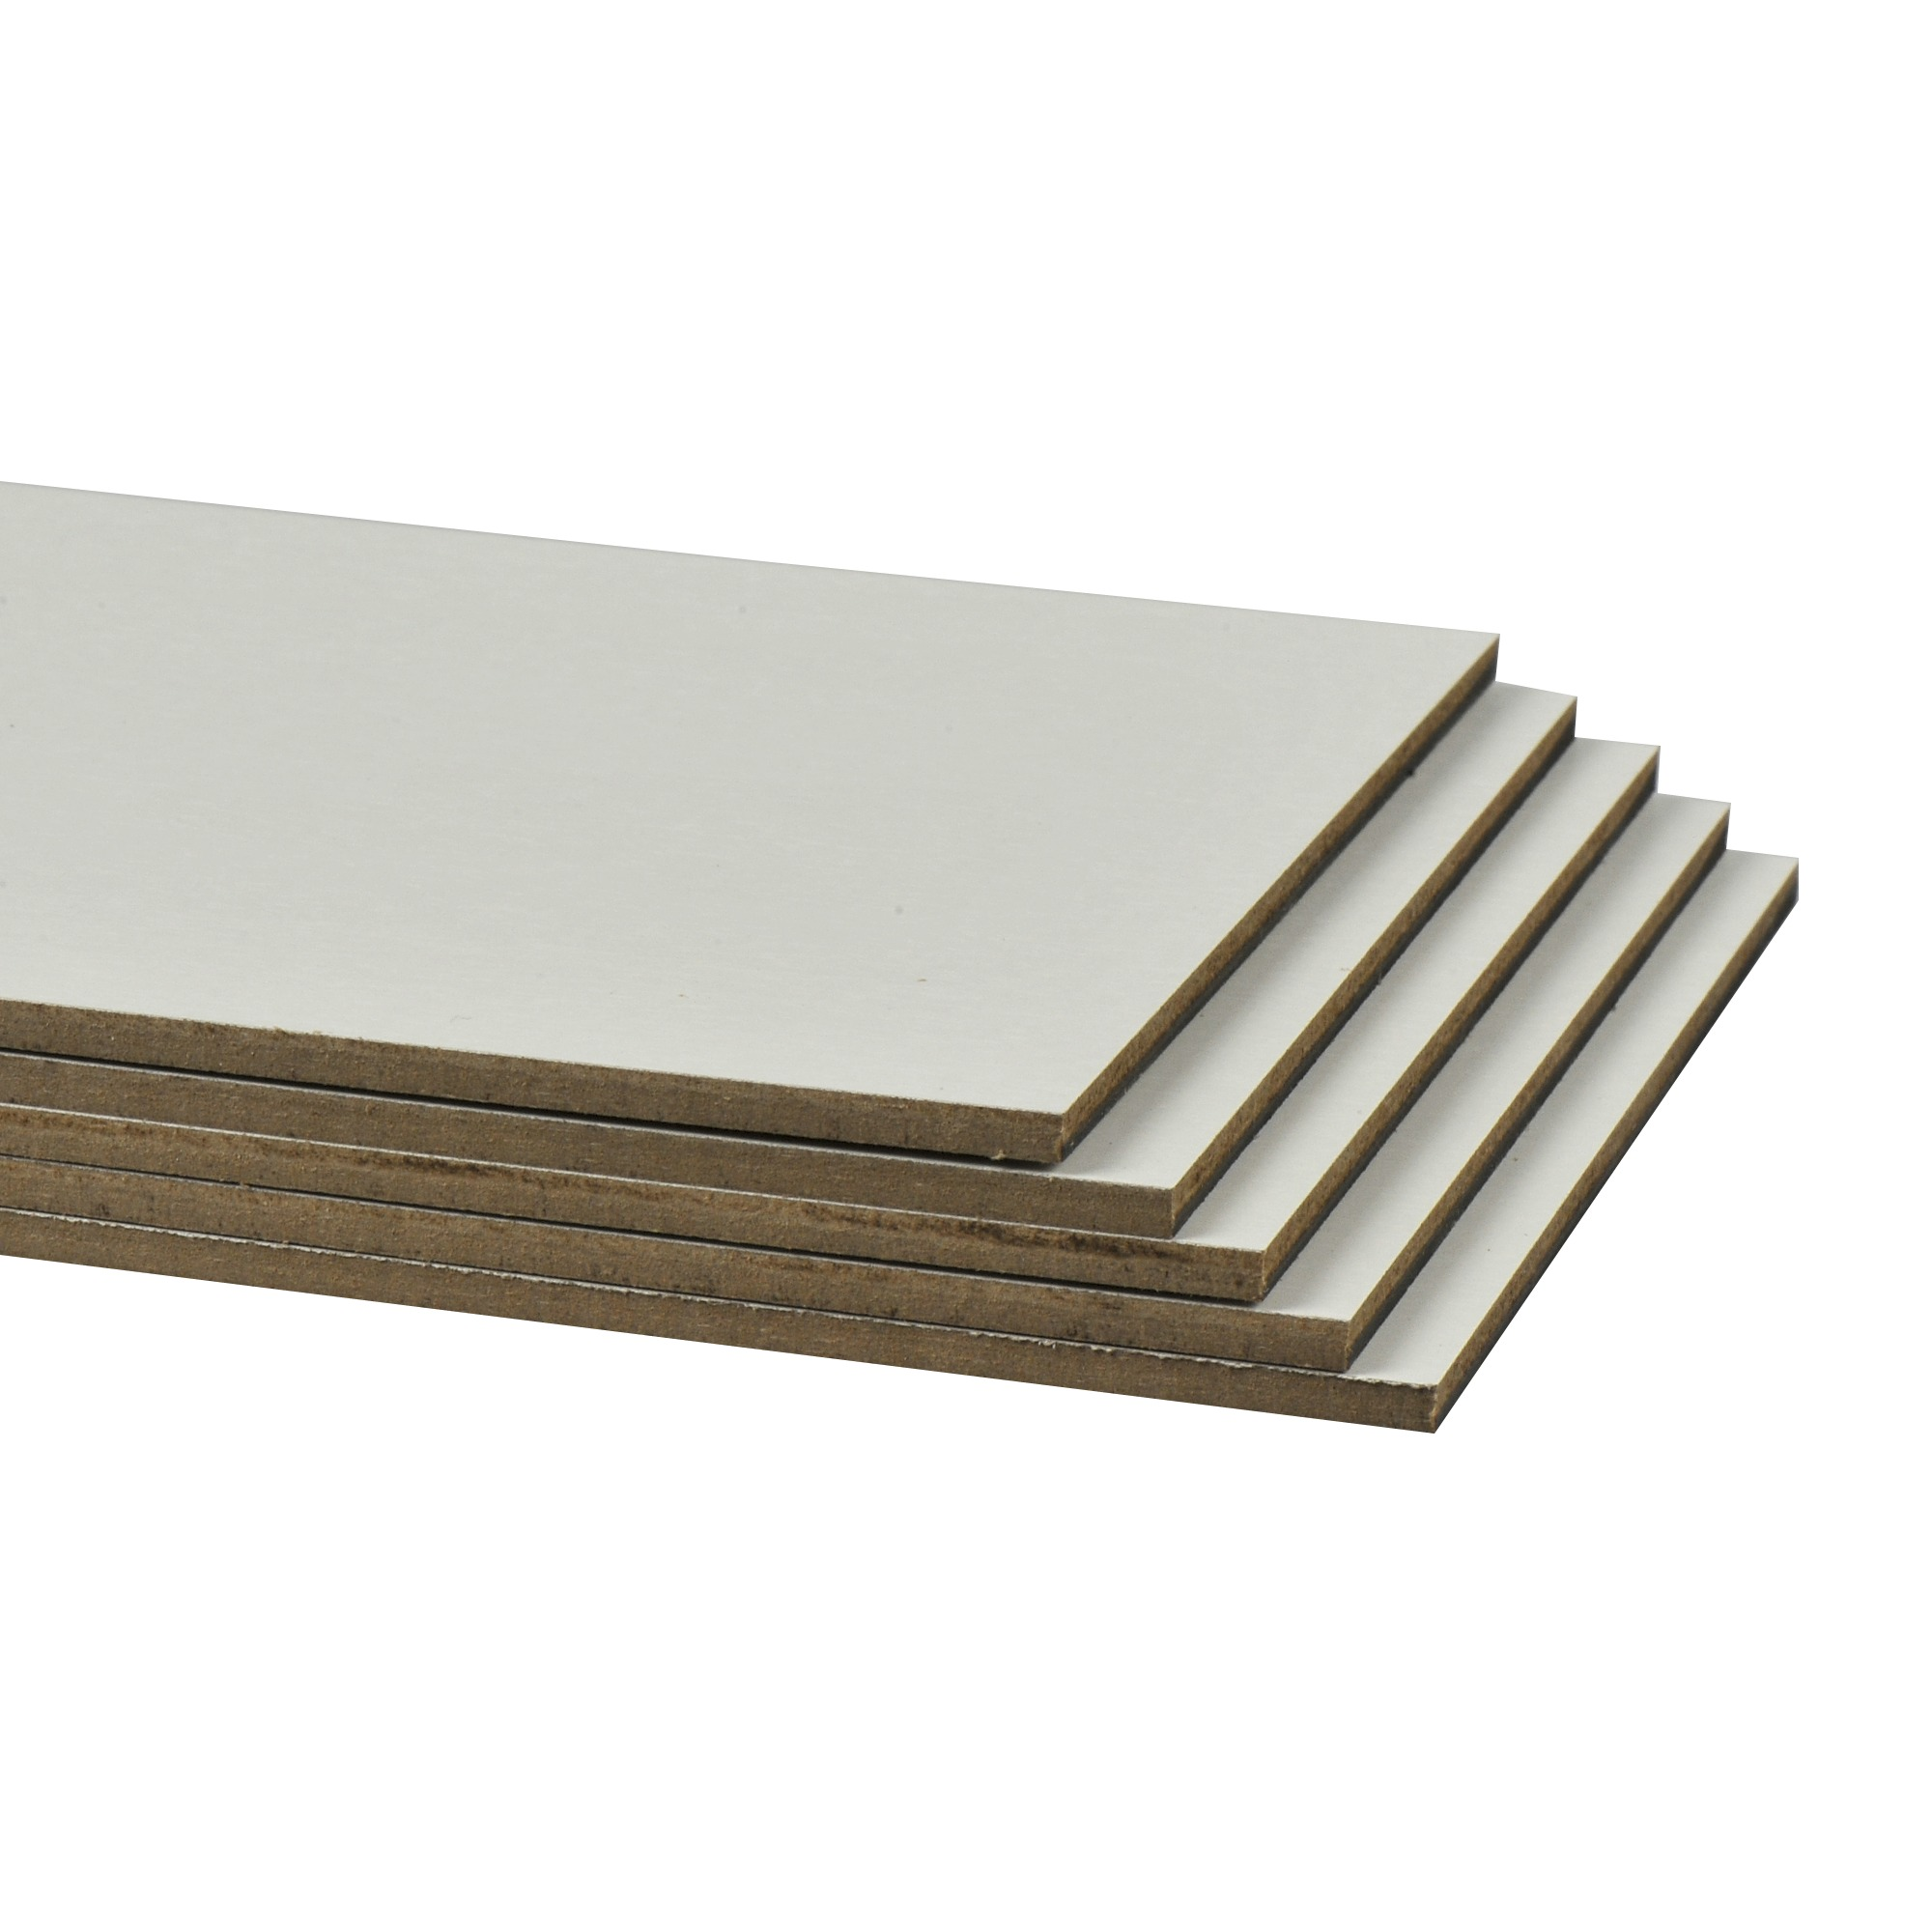 CanDo traprenovatie stootbord laminaat wit 130×20 cm 5 stuks   Traprenovatie   Trappen   Hout